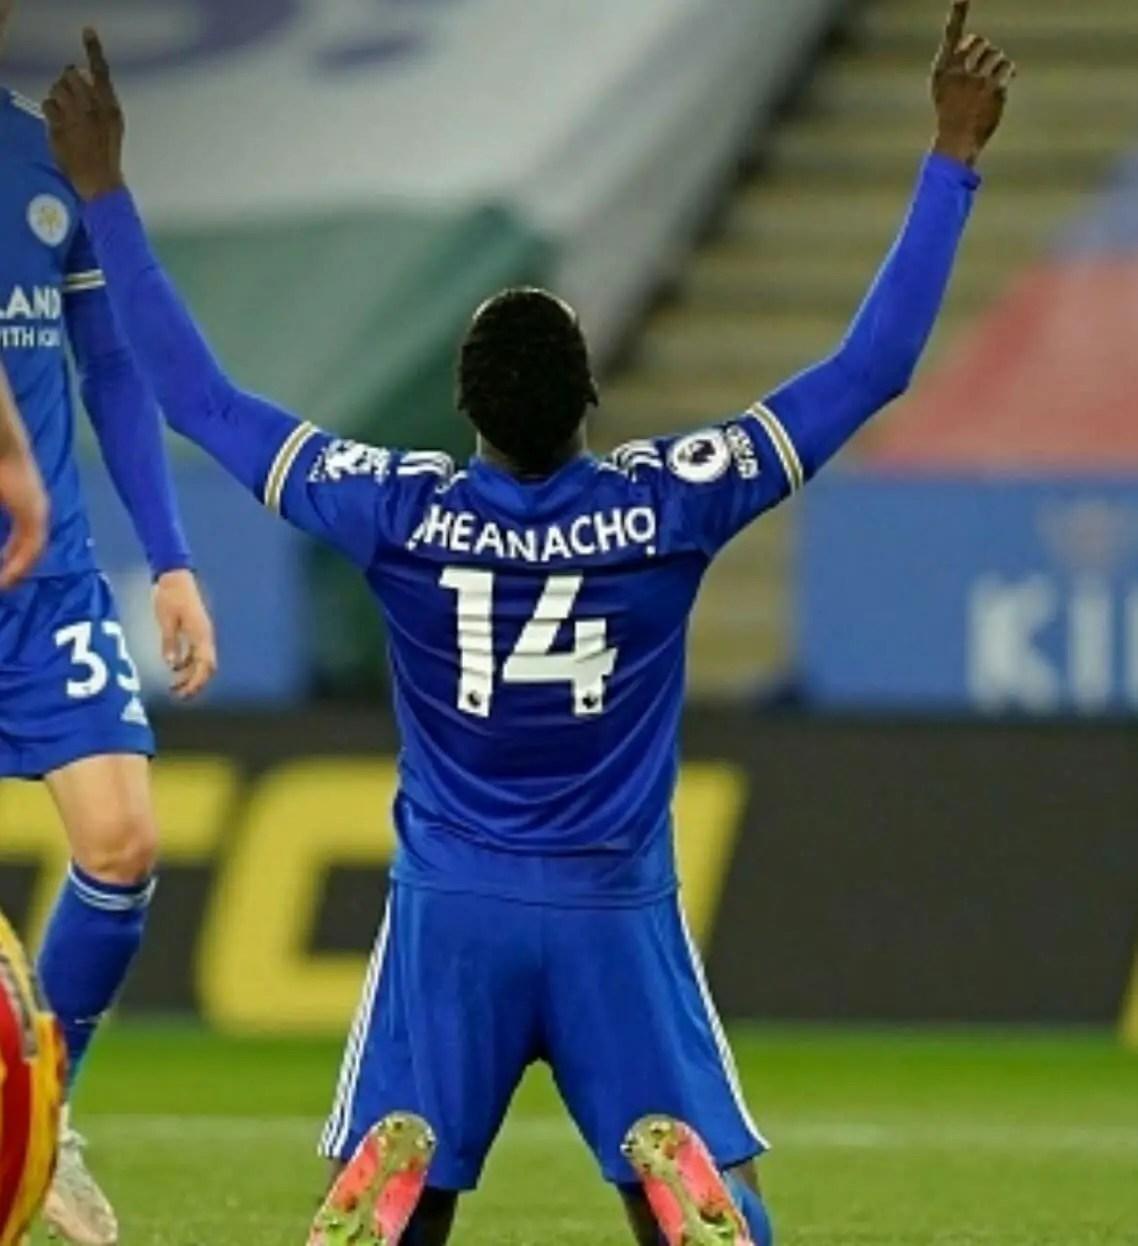 Premier League: Iheanacho Strikes Again As Leicester Thrash West Brom To Boost Top-Four Hopes